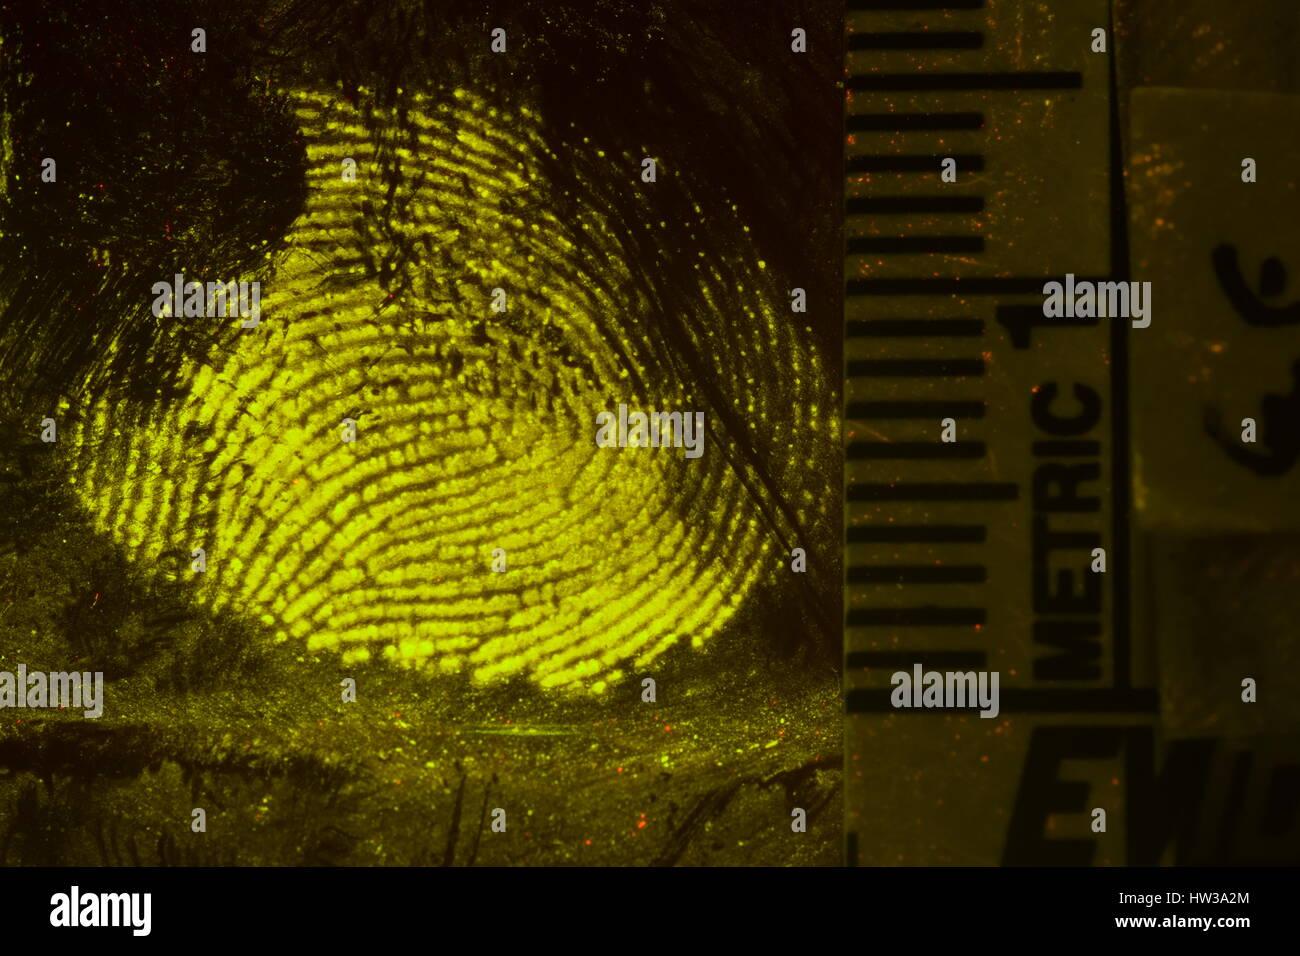 macro photography of processed fingerprints - Stock Image